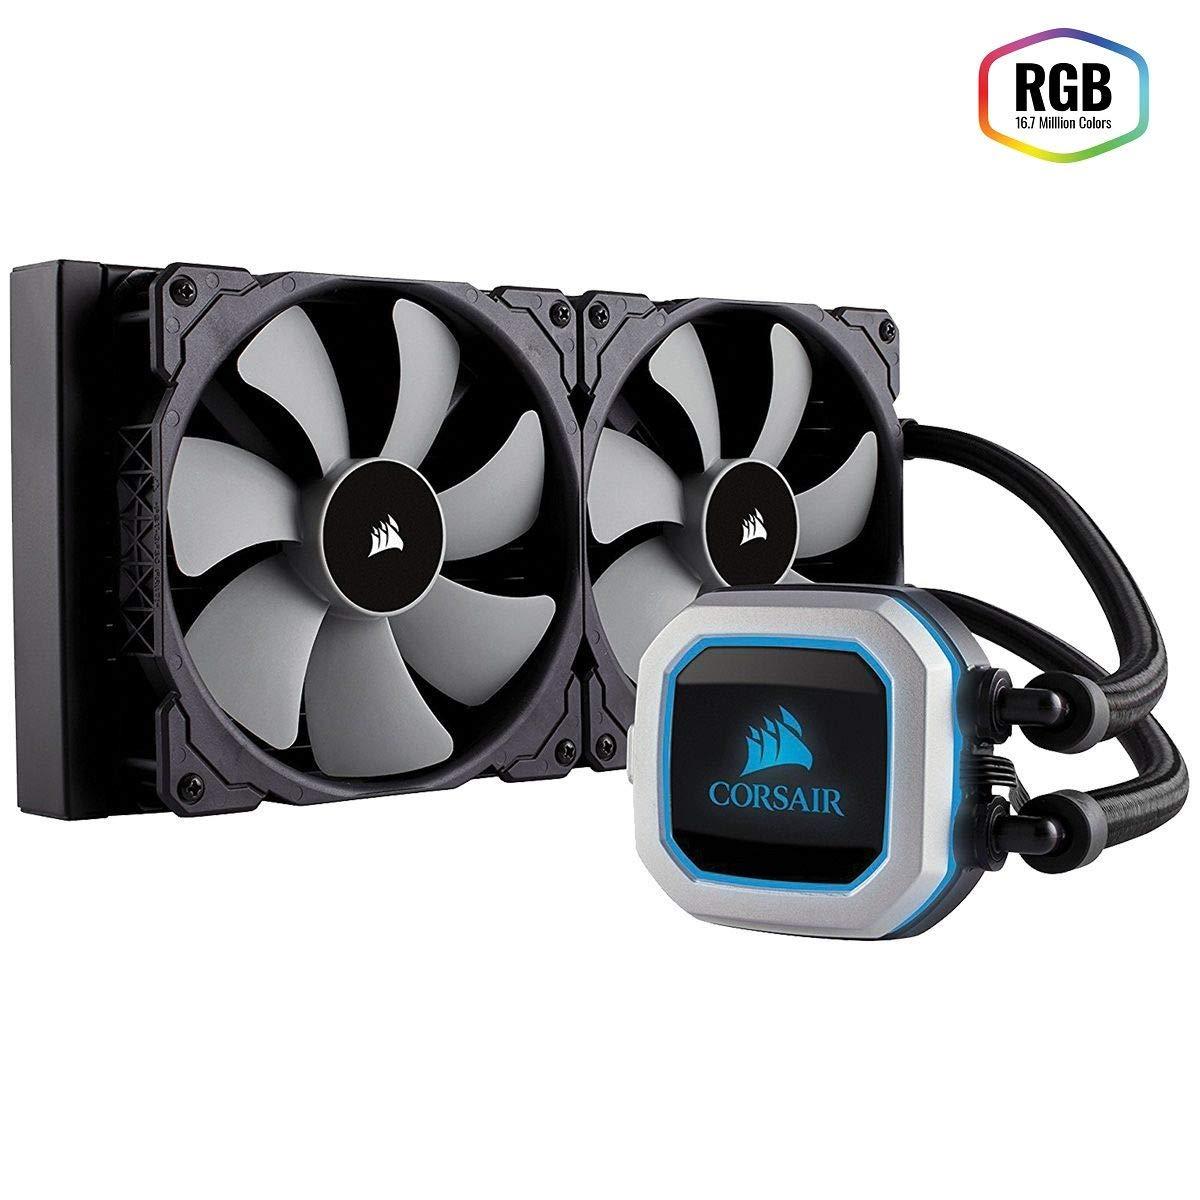 Corsair H115i PRO RGB CPU Cooler @ Amazon for £99.99